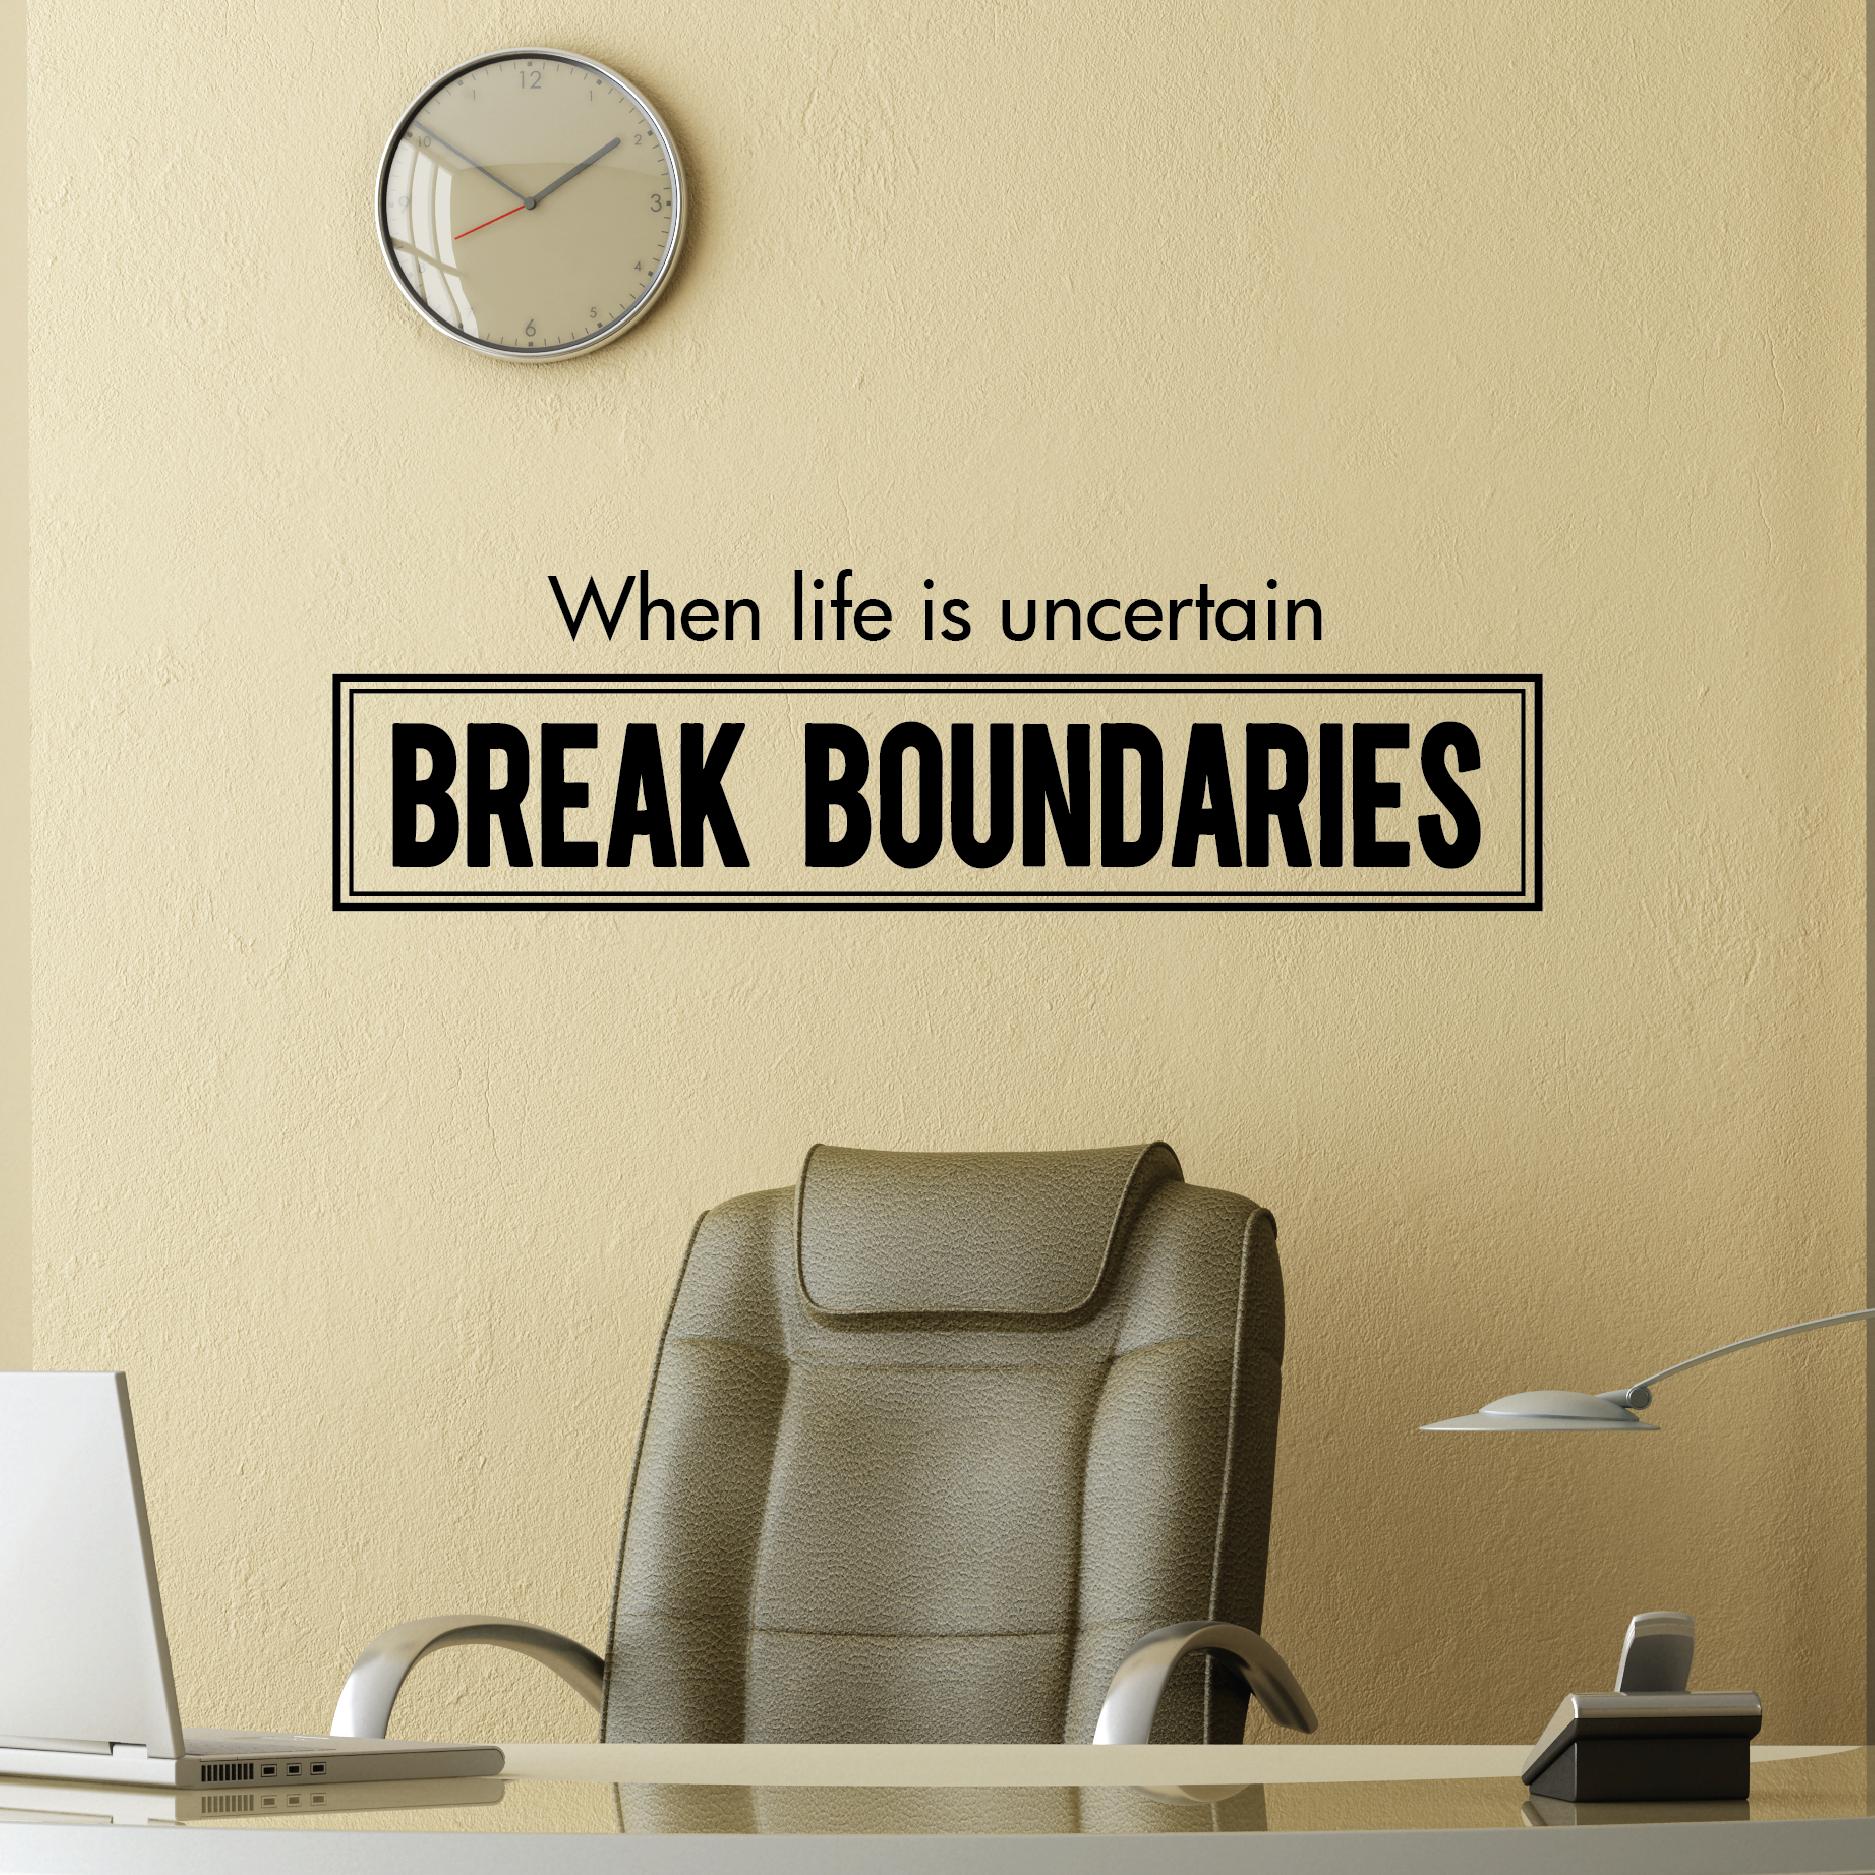 Break Boundaries Wall Quotes Decal Wallquotes Com